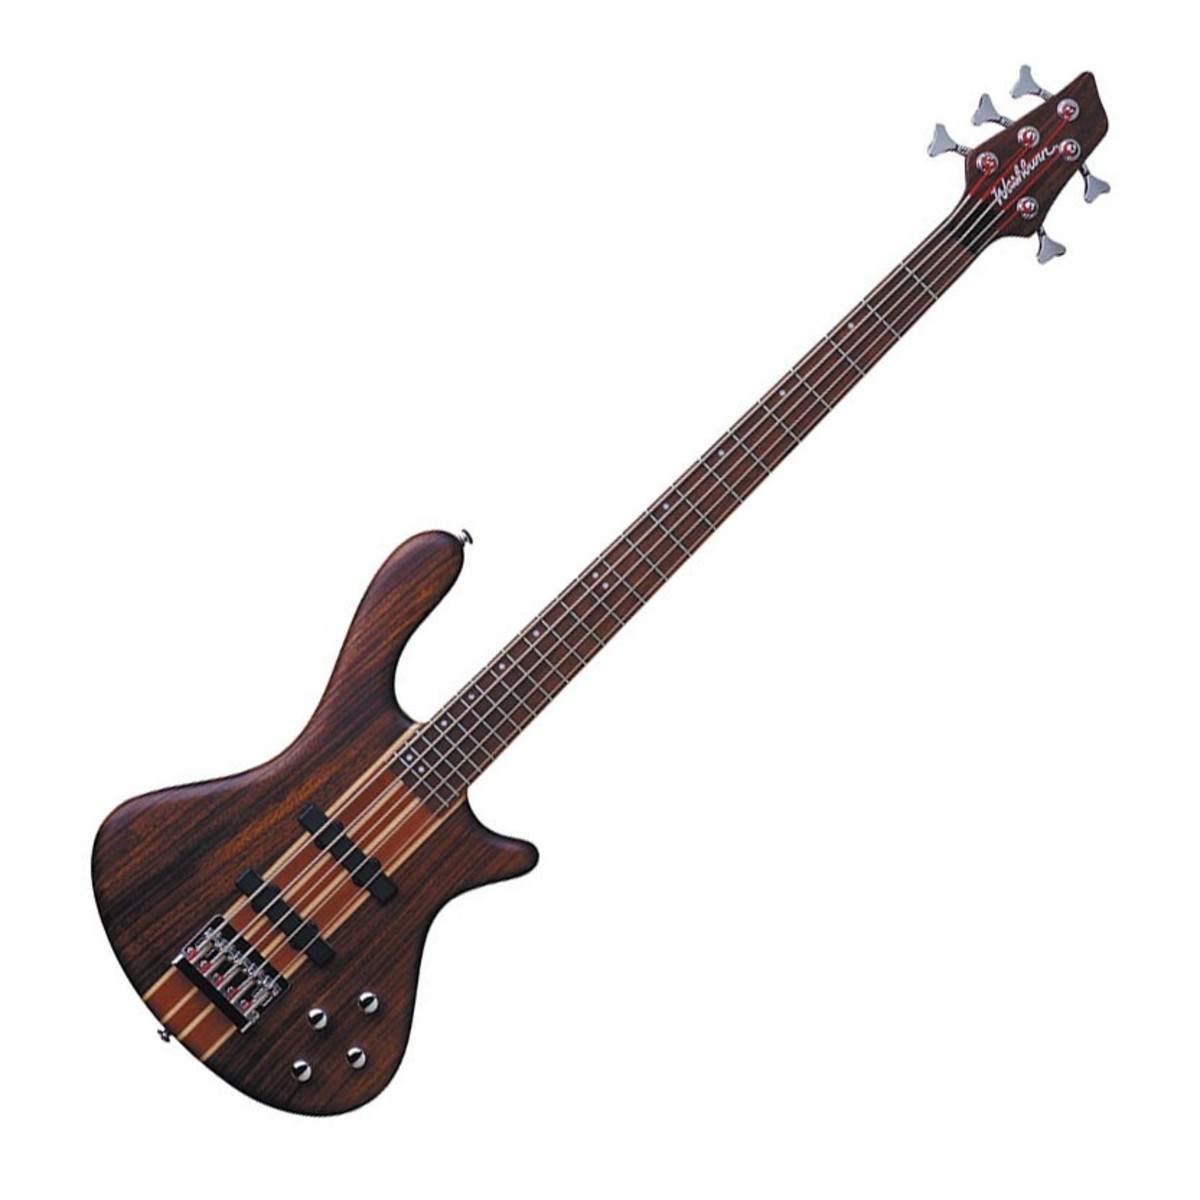 washburn t25 taurus 5 string bass natural at gear4music. Black Bedroom Furniture Sets. Home Design Ideas